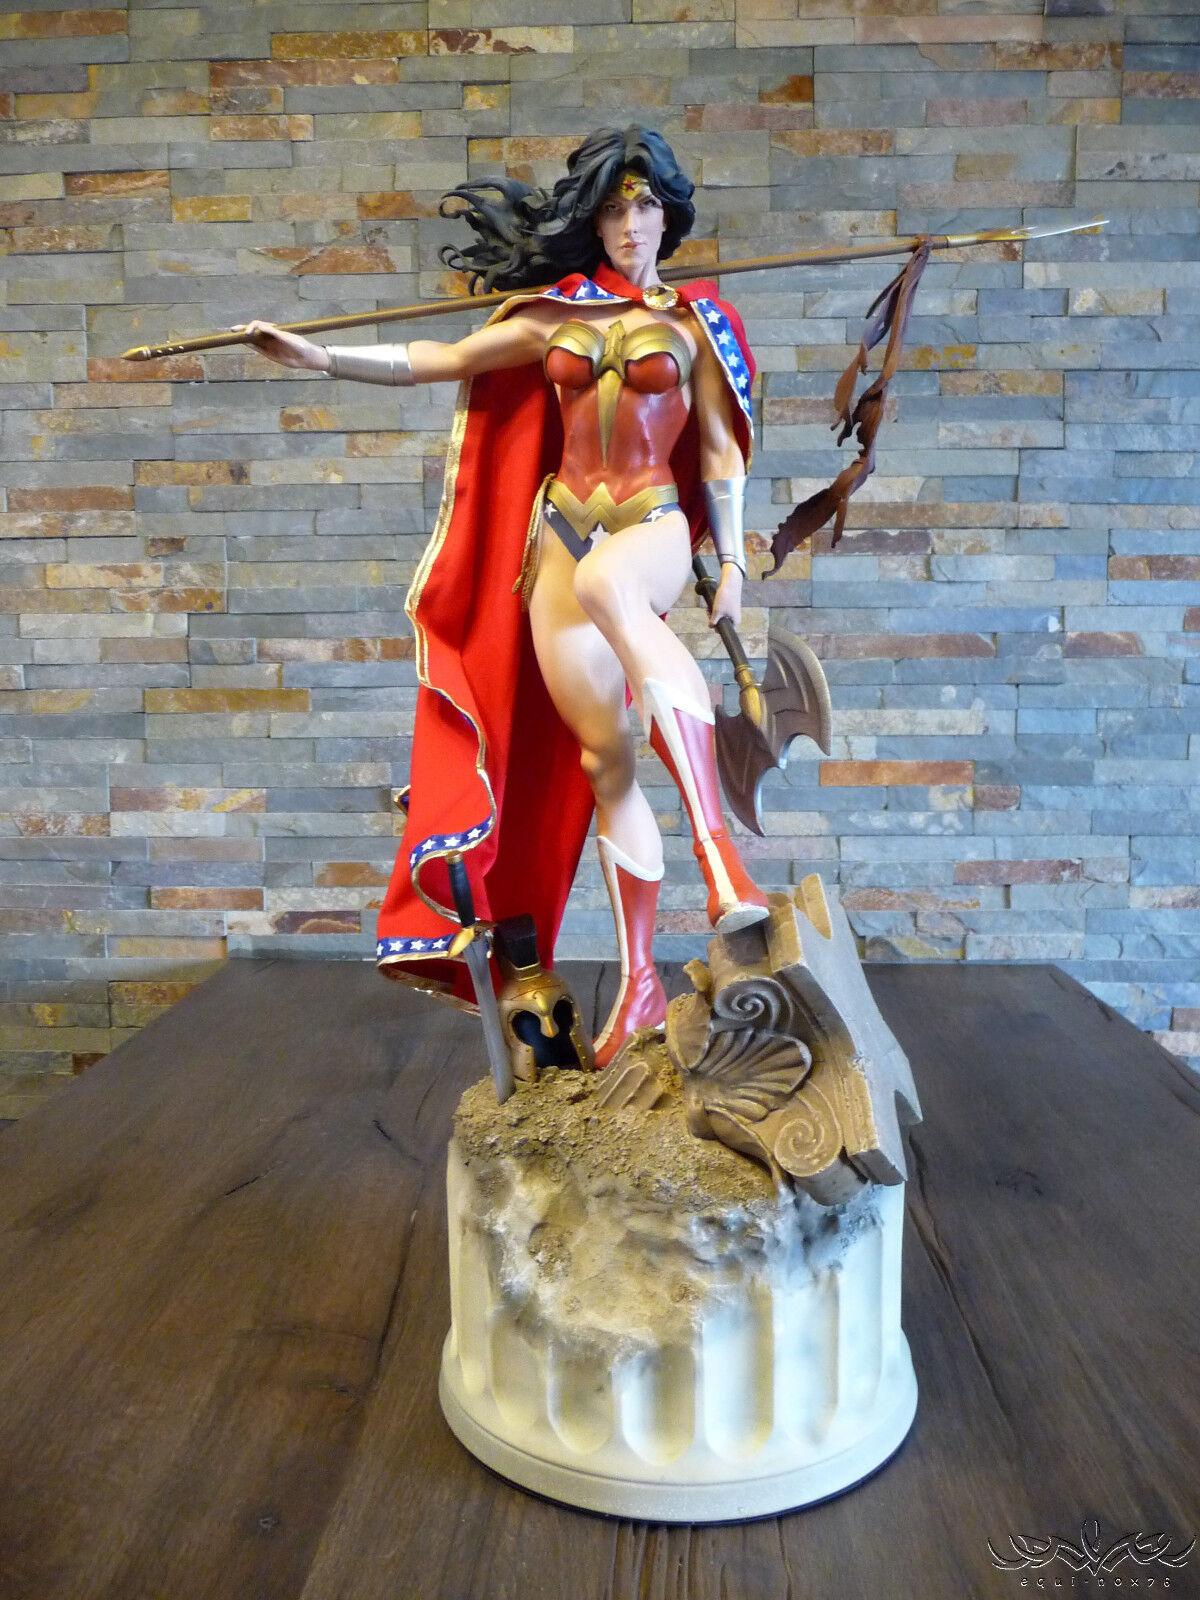 hermoso Wonder Mujer Sideshow 1 4 Cape solamente    para Premium Format NUEVO hecho a mano ooak  Wow   muchas concesiones